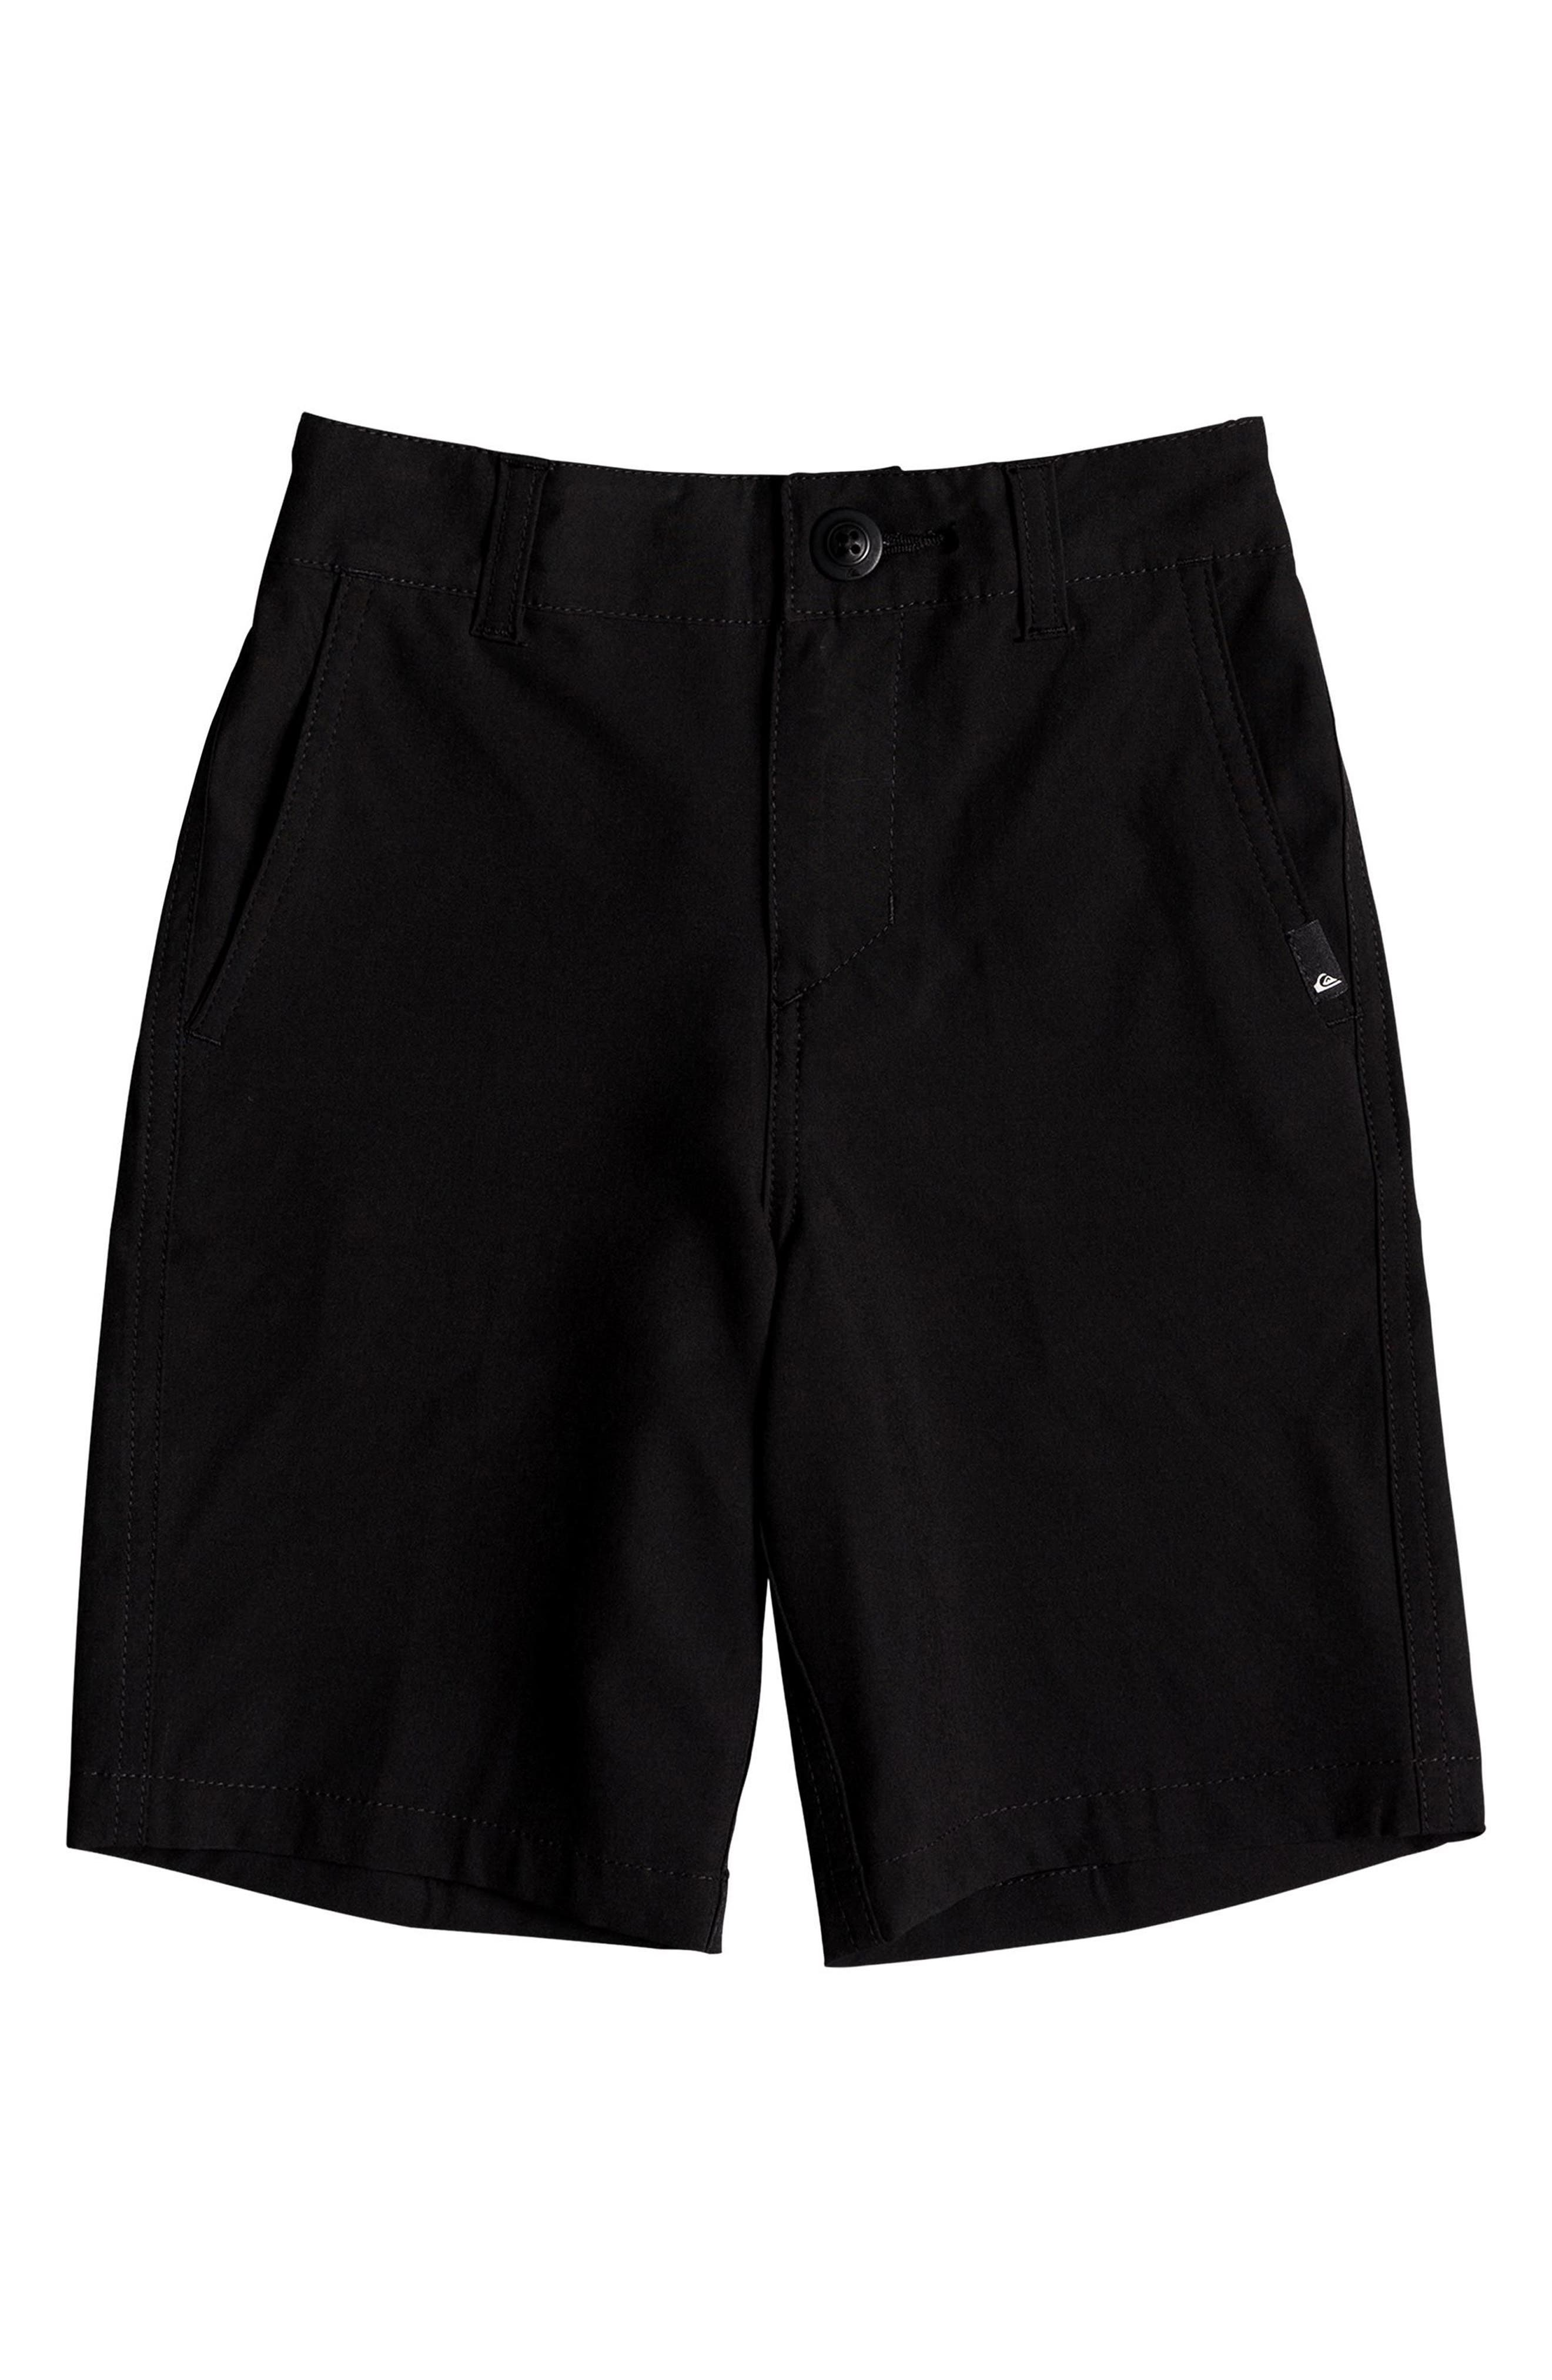 Union Amphibian Hybrid Shorts,                         Main,                         color, BLACK